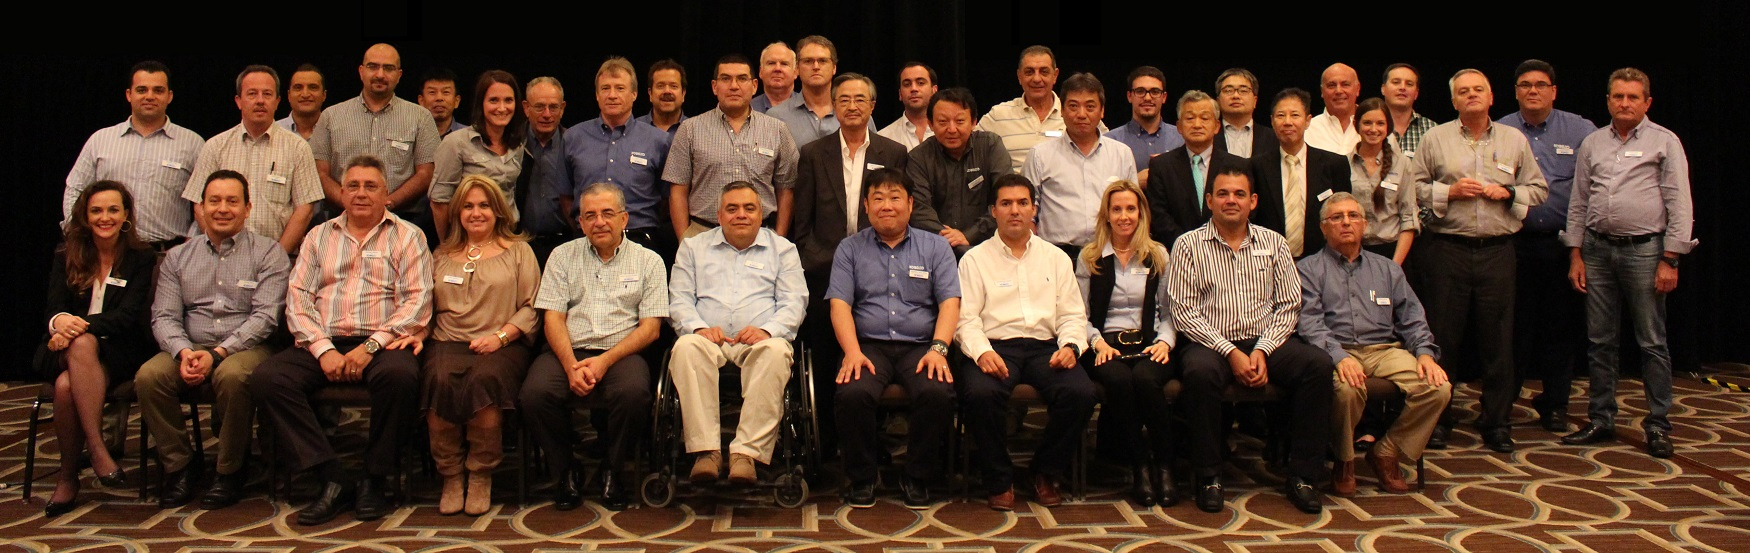 KOBELCO Hosts Successful Latin America Dealer Meeting